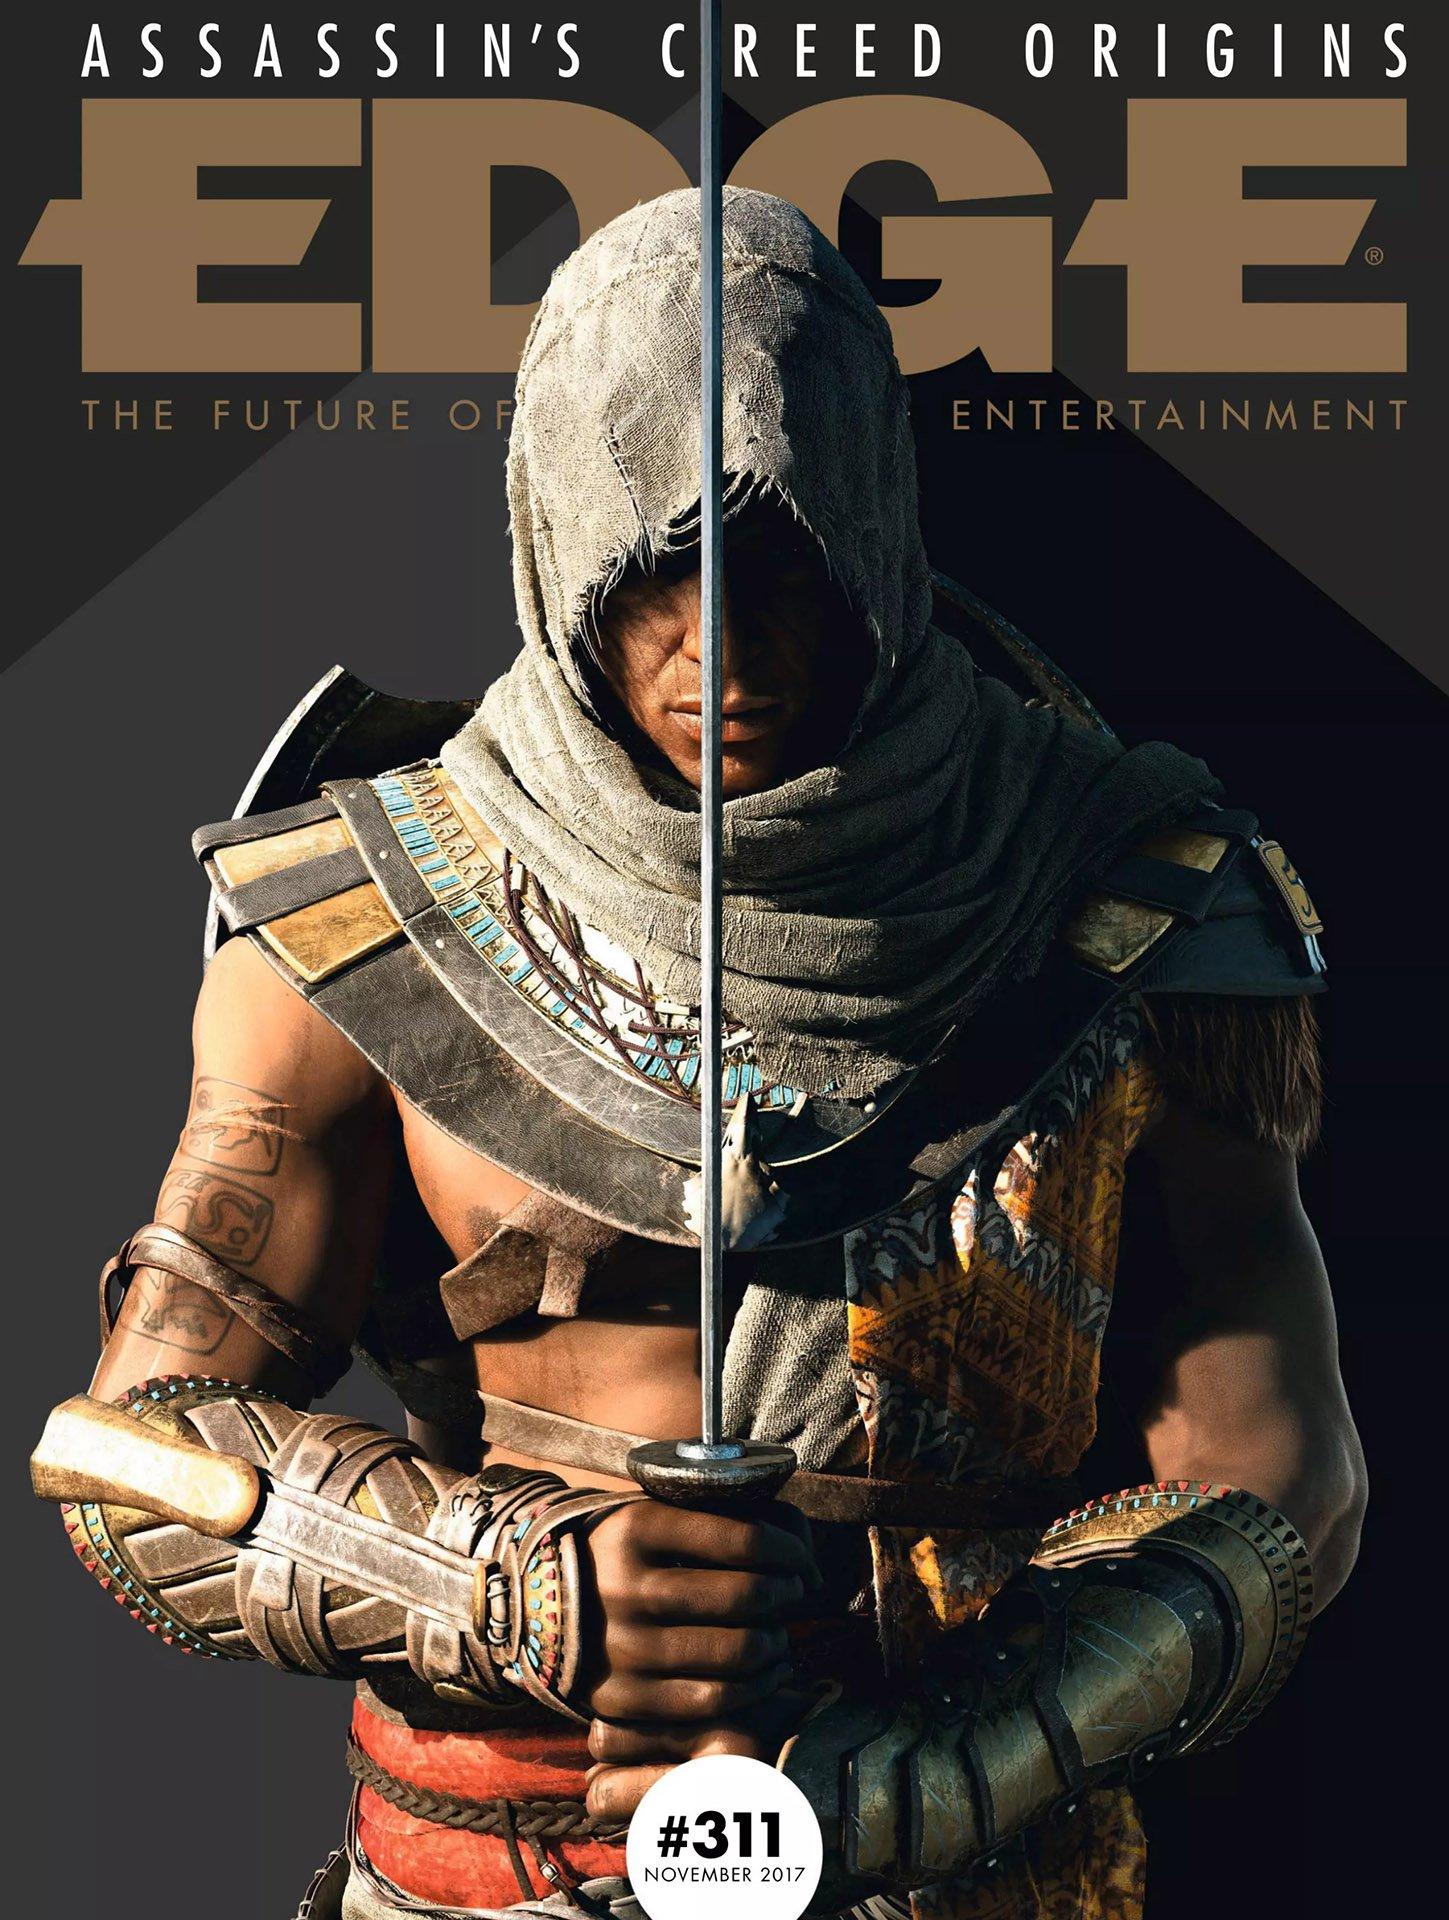 Edge 311 (November 2017)